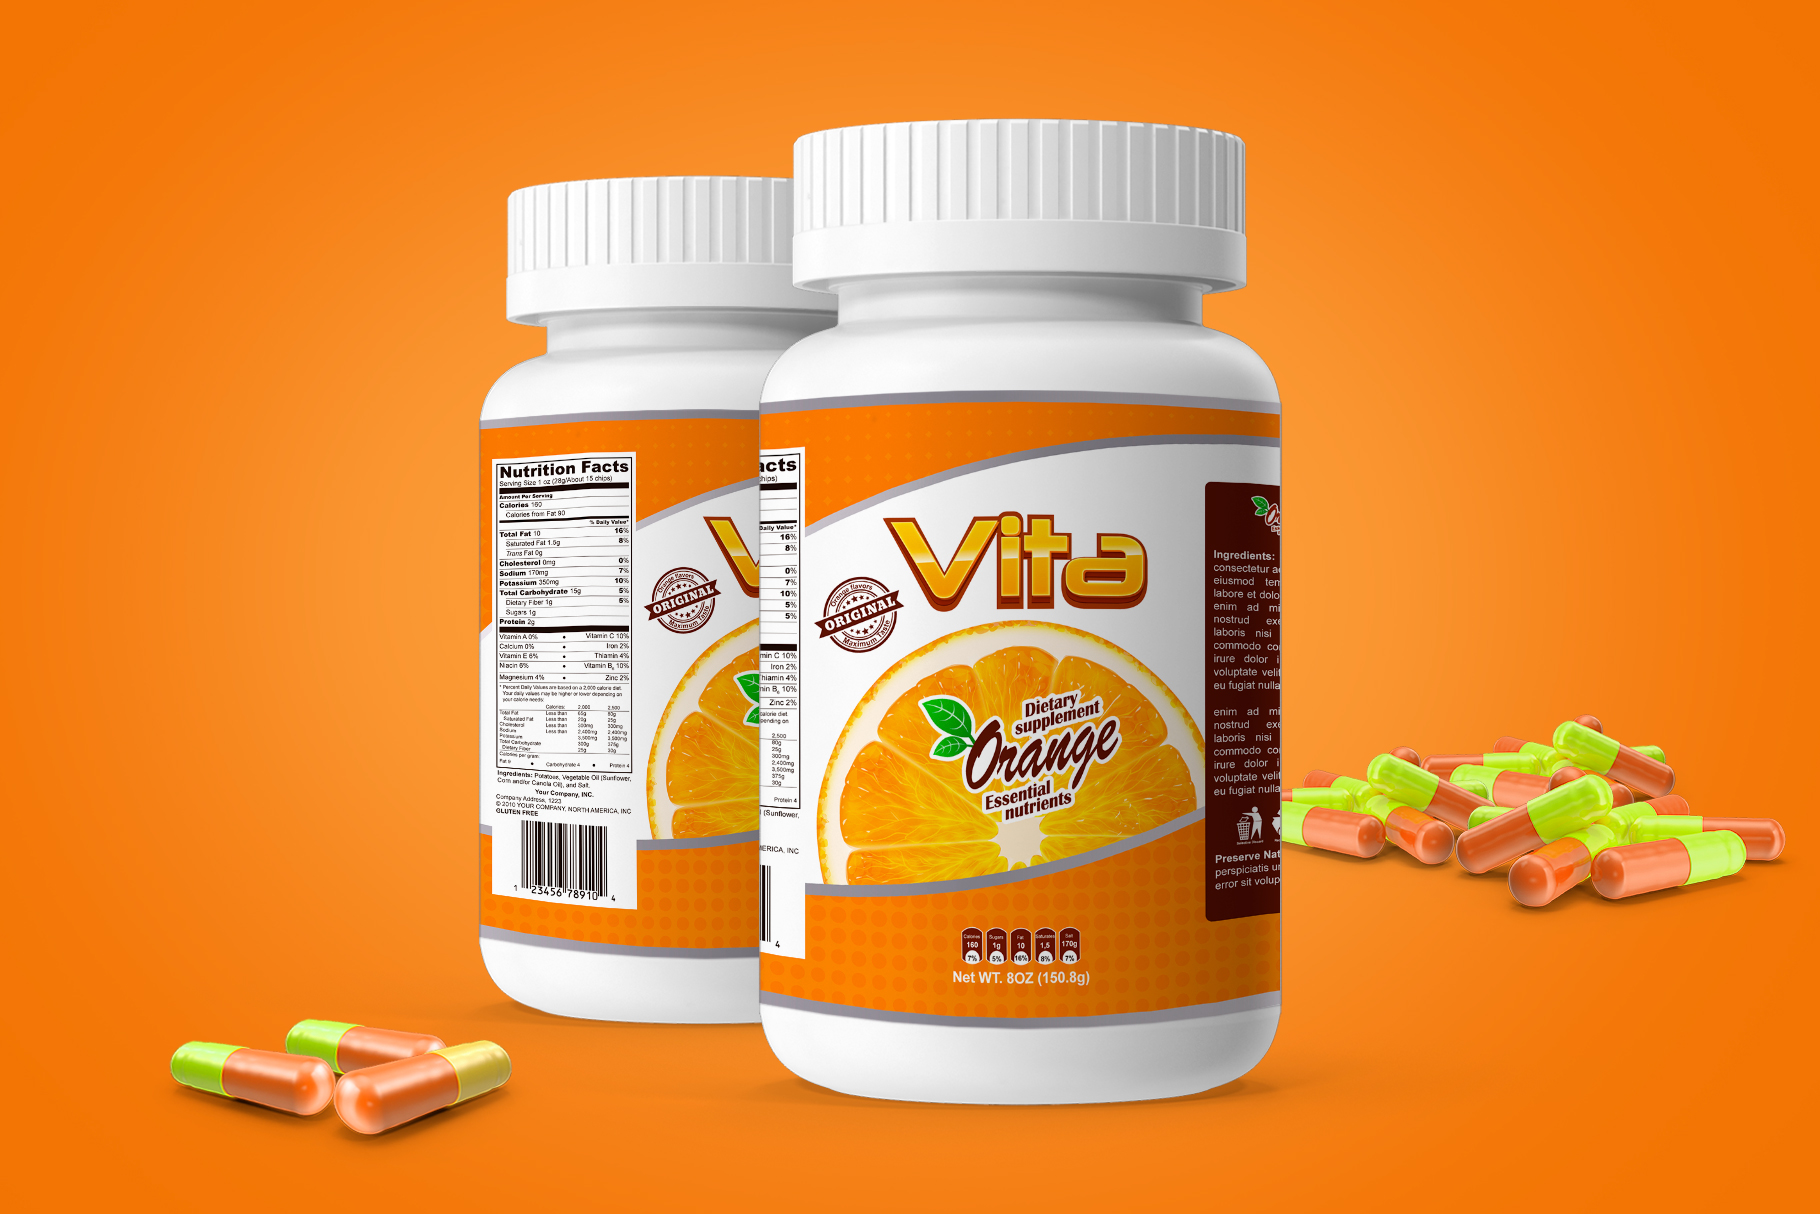 Pills Bottle Vitamin example image 1